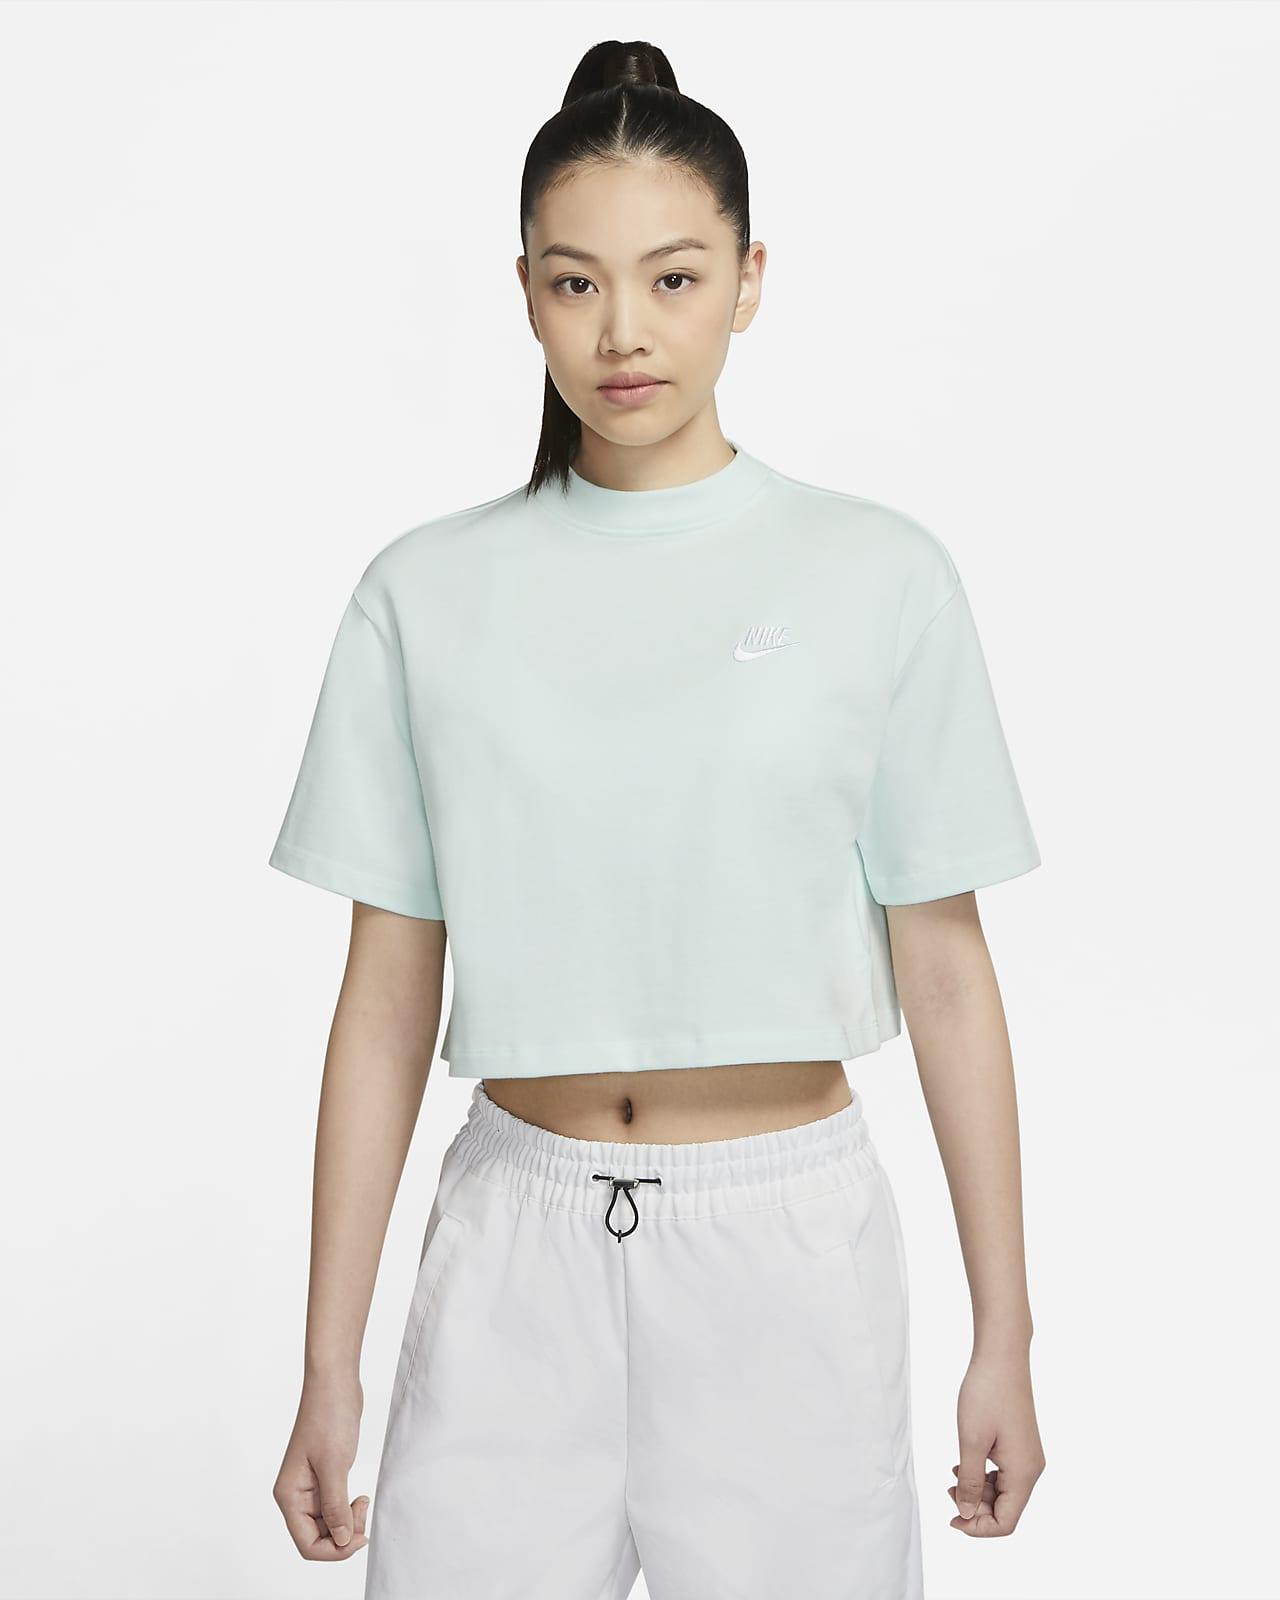 Nike Sportswear 女子短袖针织上衣